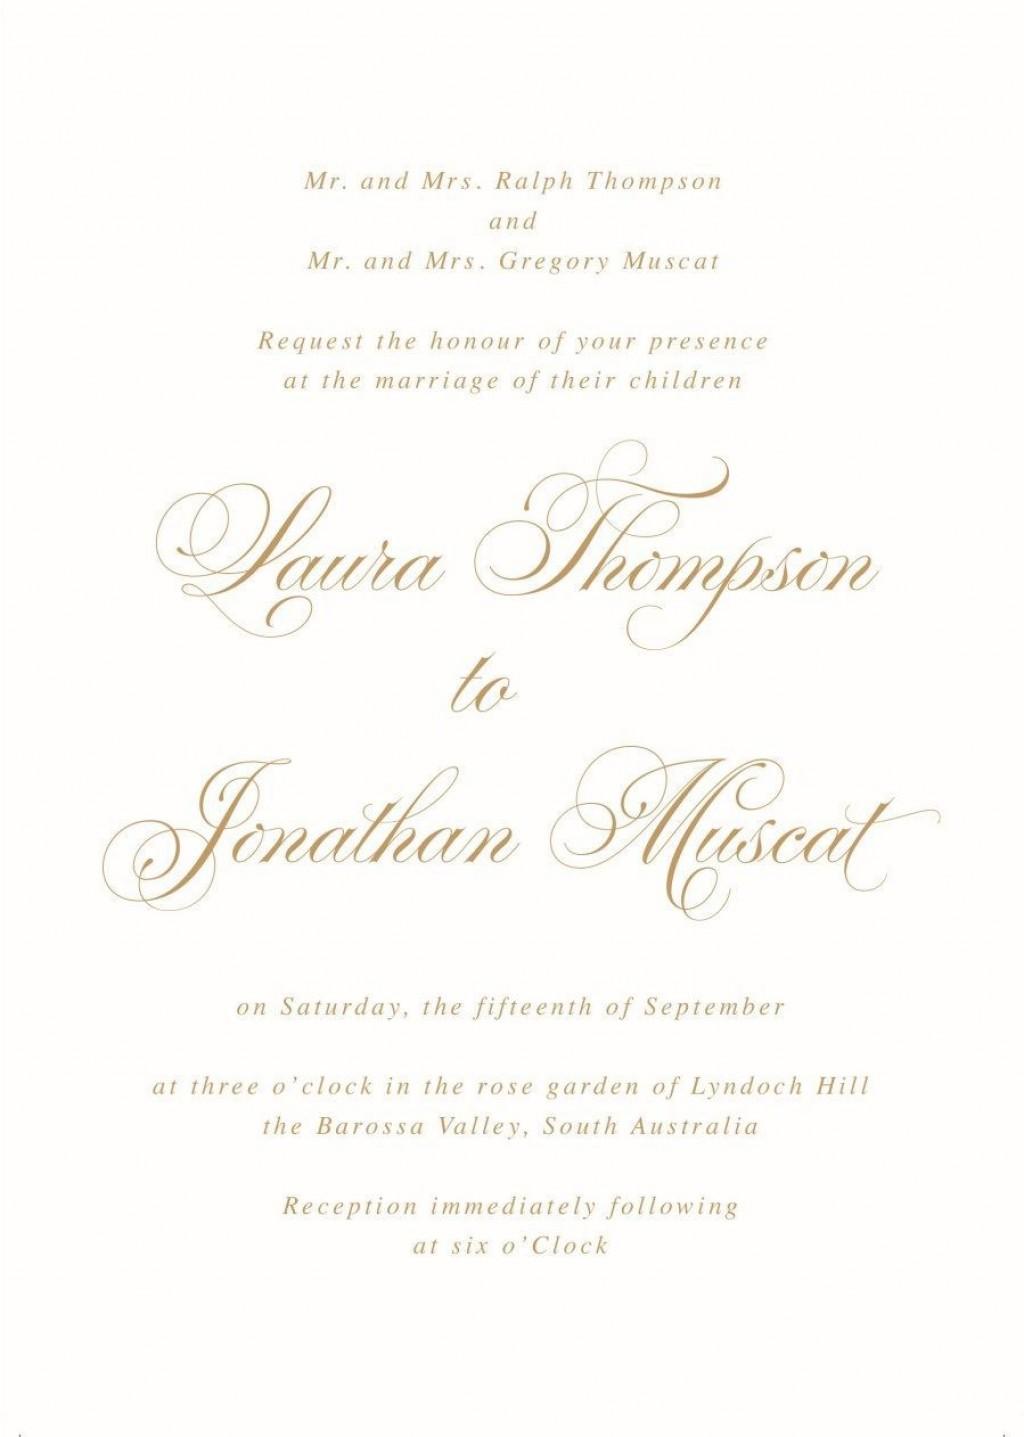 001 Fantastic Formal Wedding Invitation Wording Template Picture  TemplatesLarge